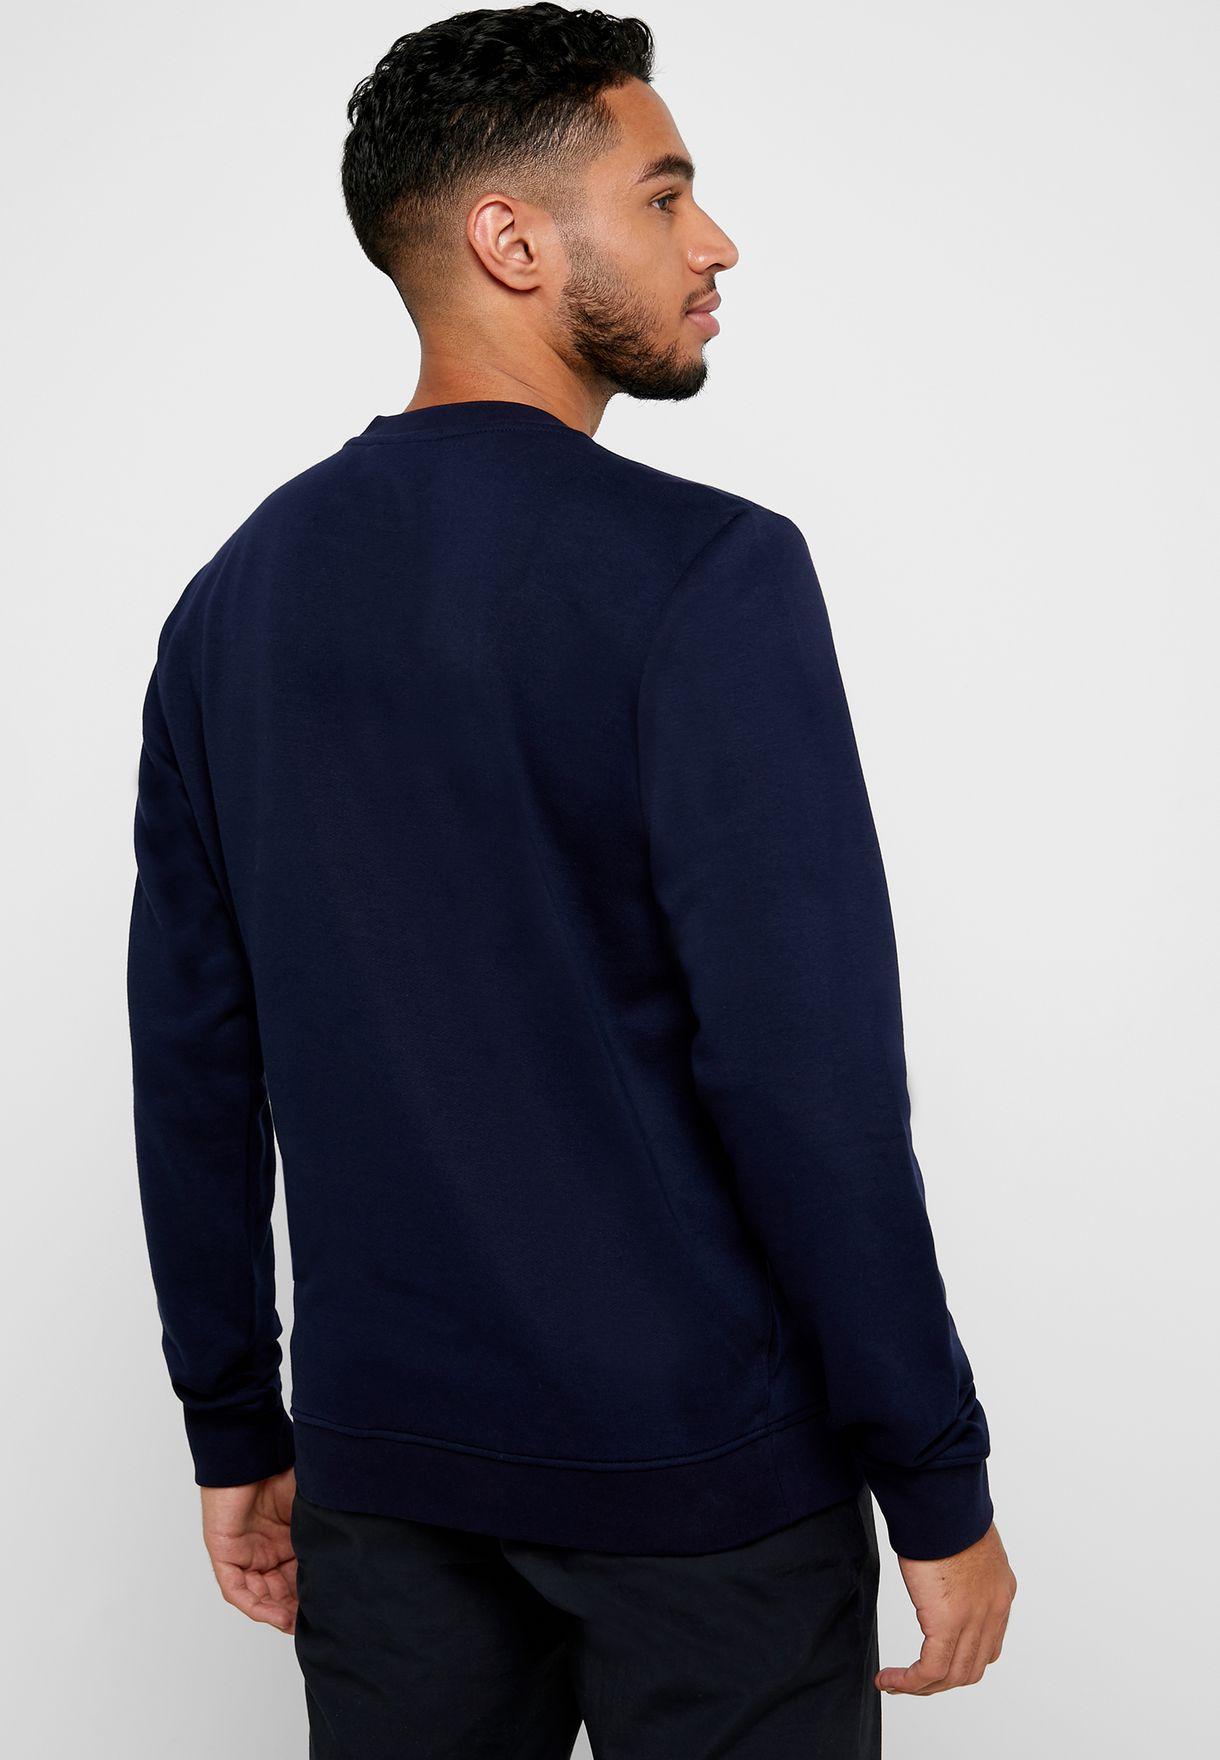 Large Logo Sweatshirt